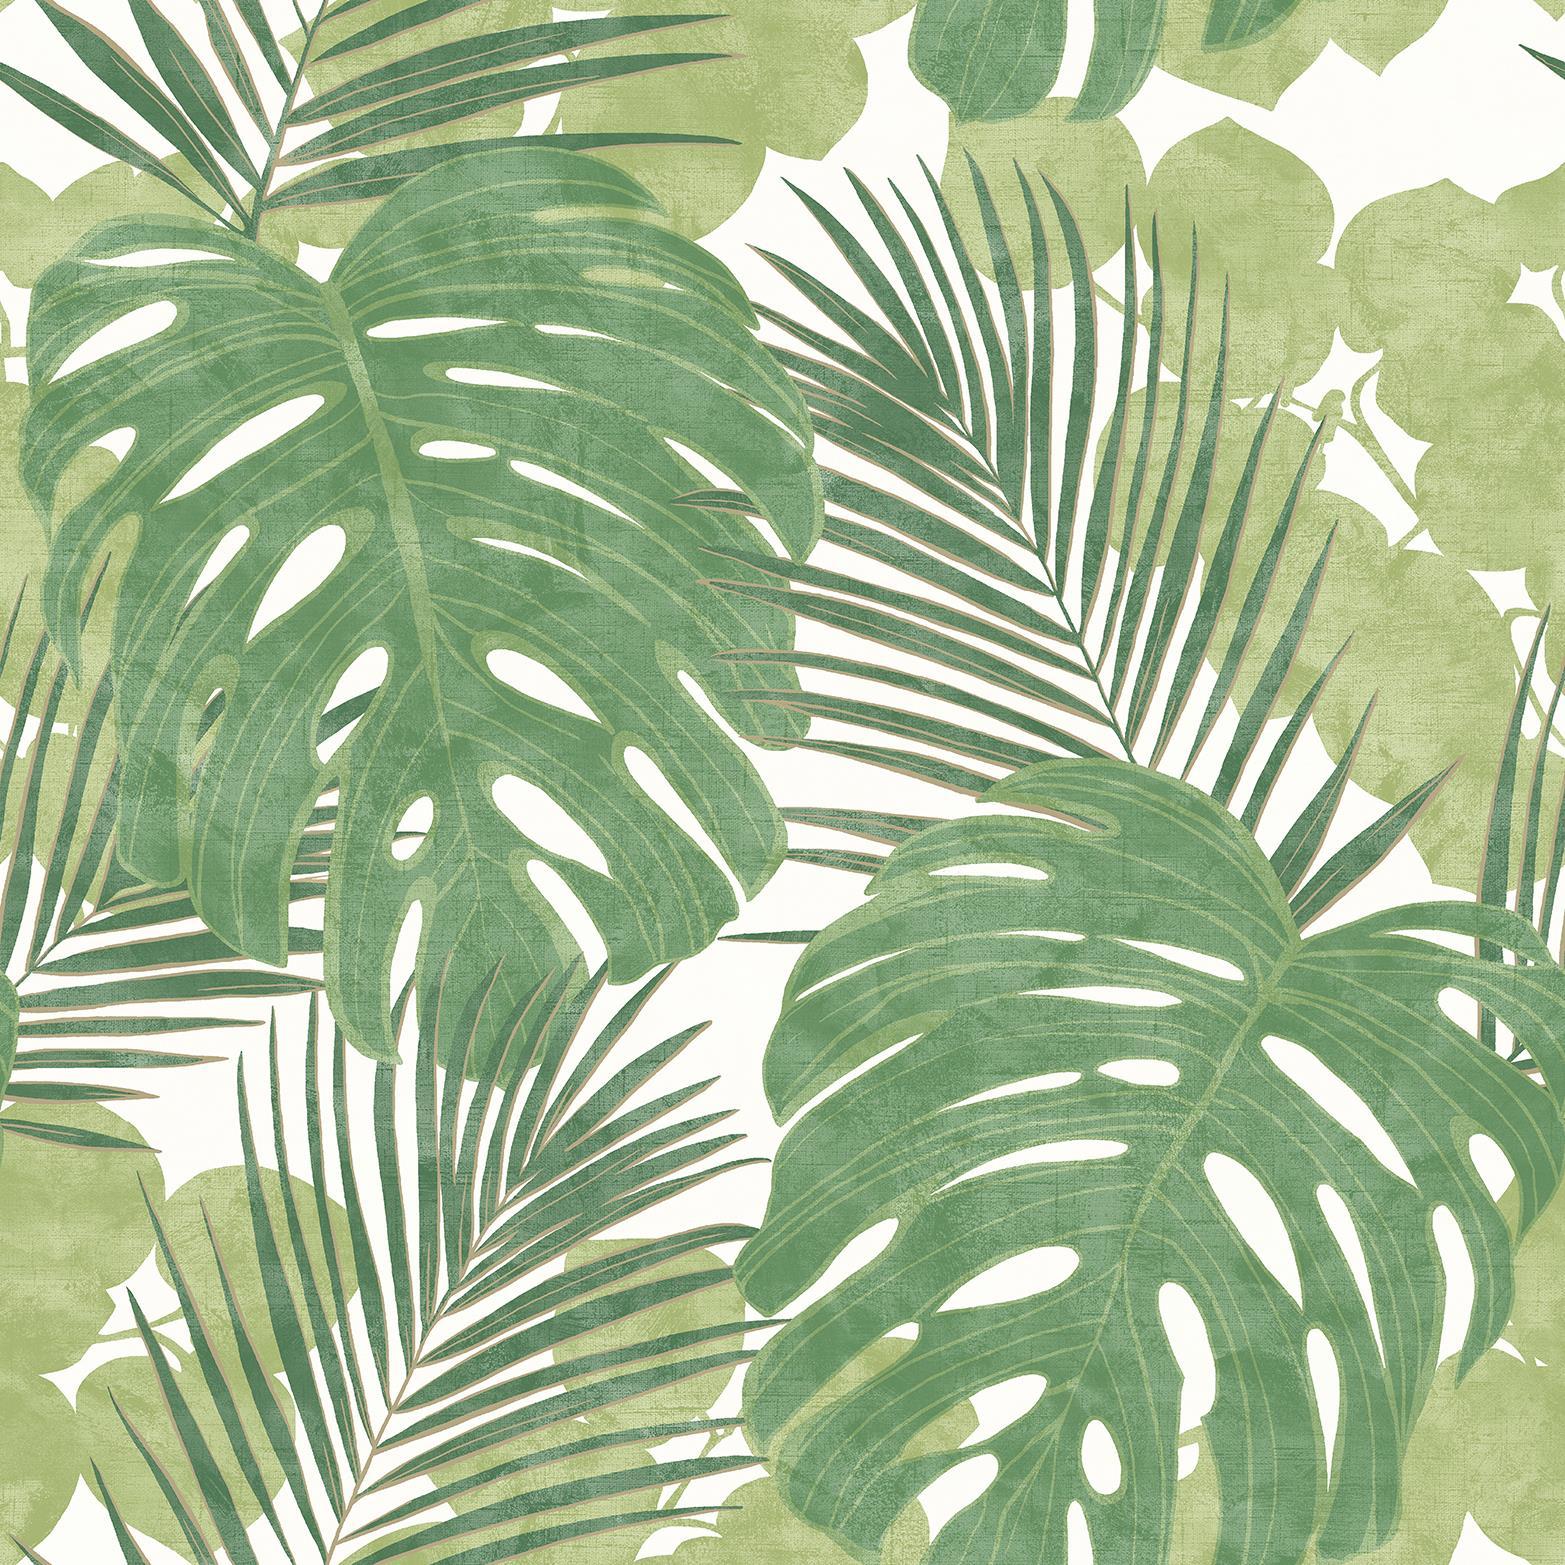 Rasch Jungle Large Leaf Wallpaper Palm Botanical Floral Tropical Green White Ebay 3300 x 4200 jpeg 868 кб. details about rasch jungle large leaf wallpaper palm botanical floral tropical green white